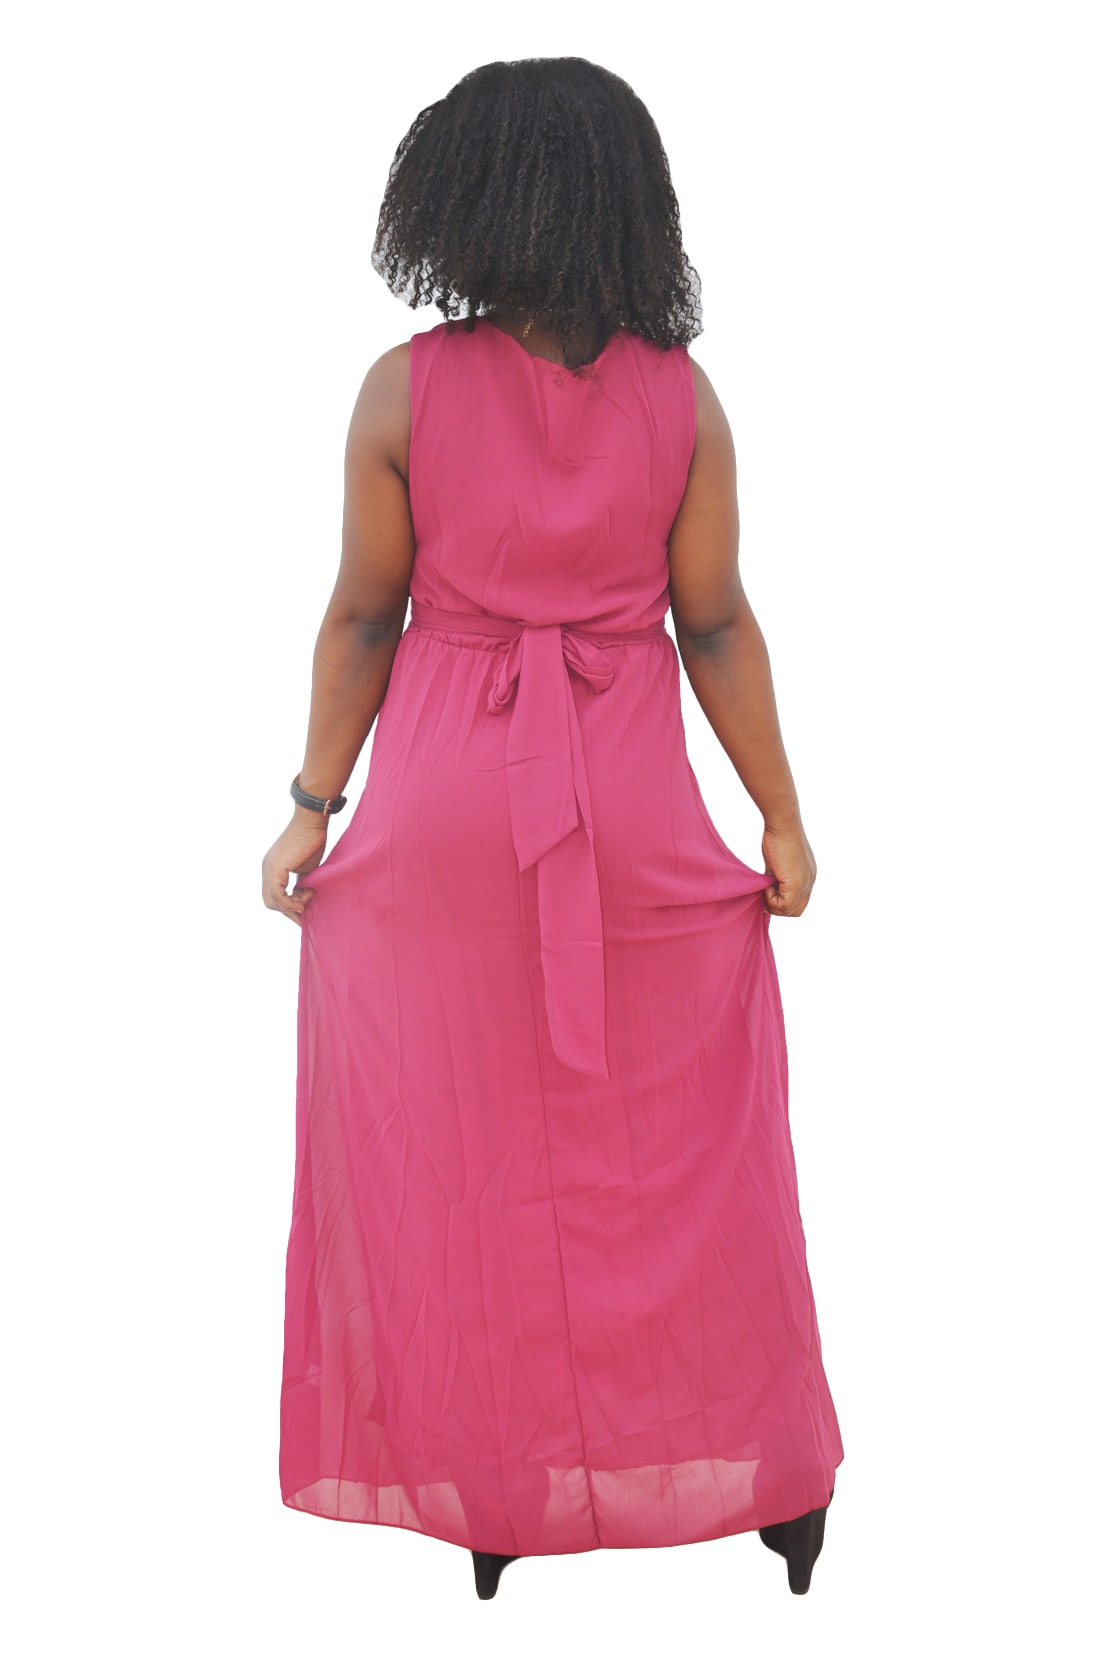 M0297 winered2 Bohemian Dresses maureens.com boutique